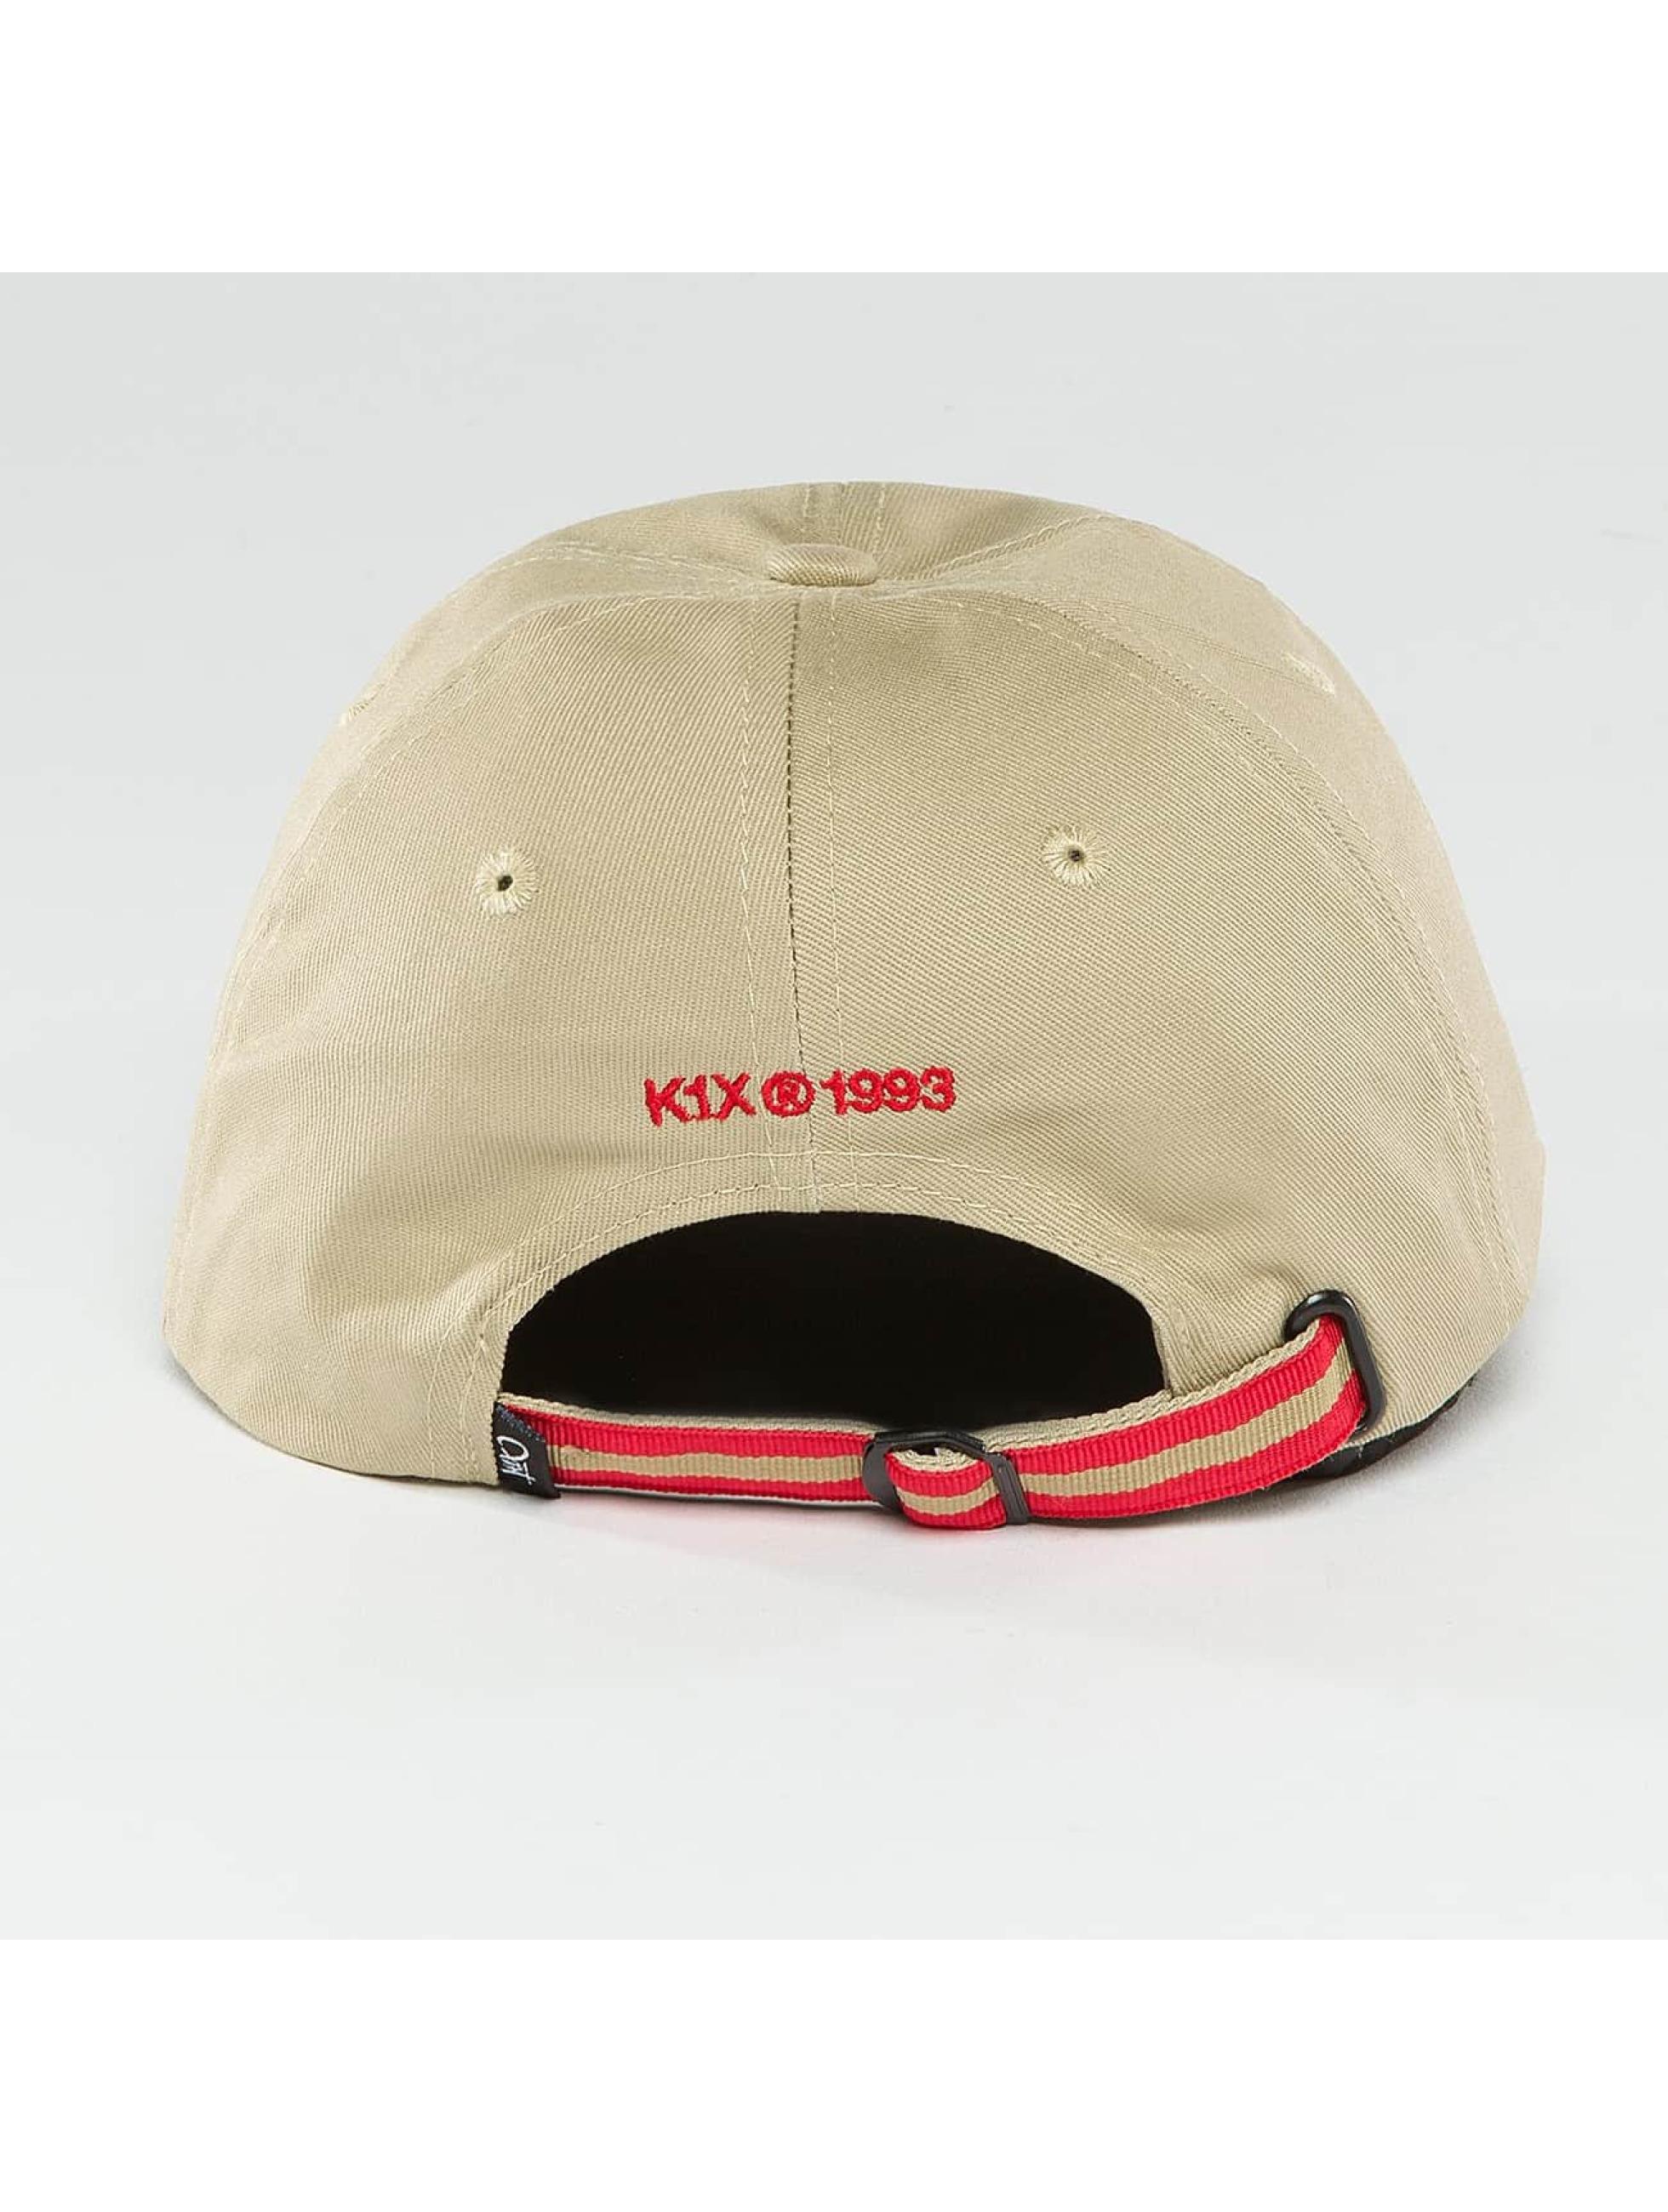 K1X Snapback Caps Play Hard Basketball Sports khaki